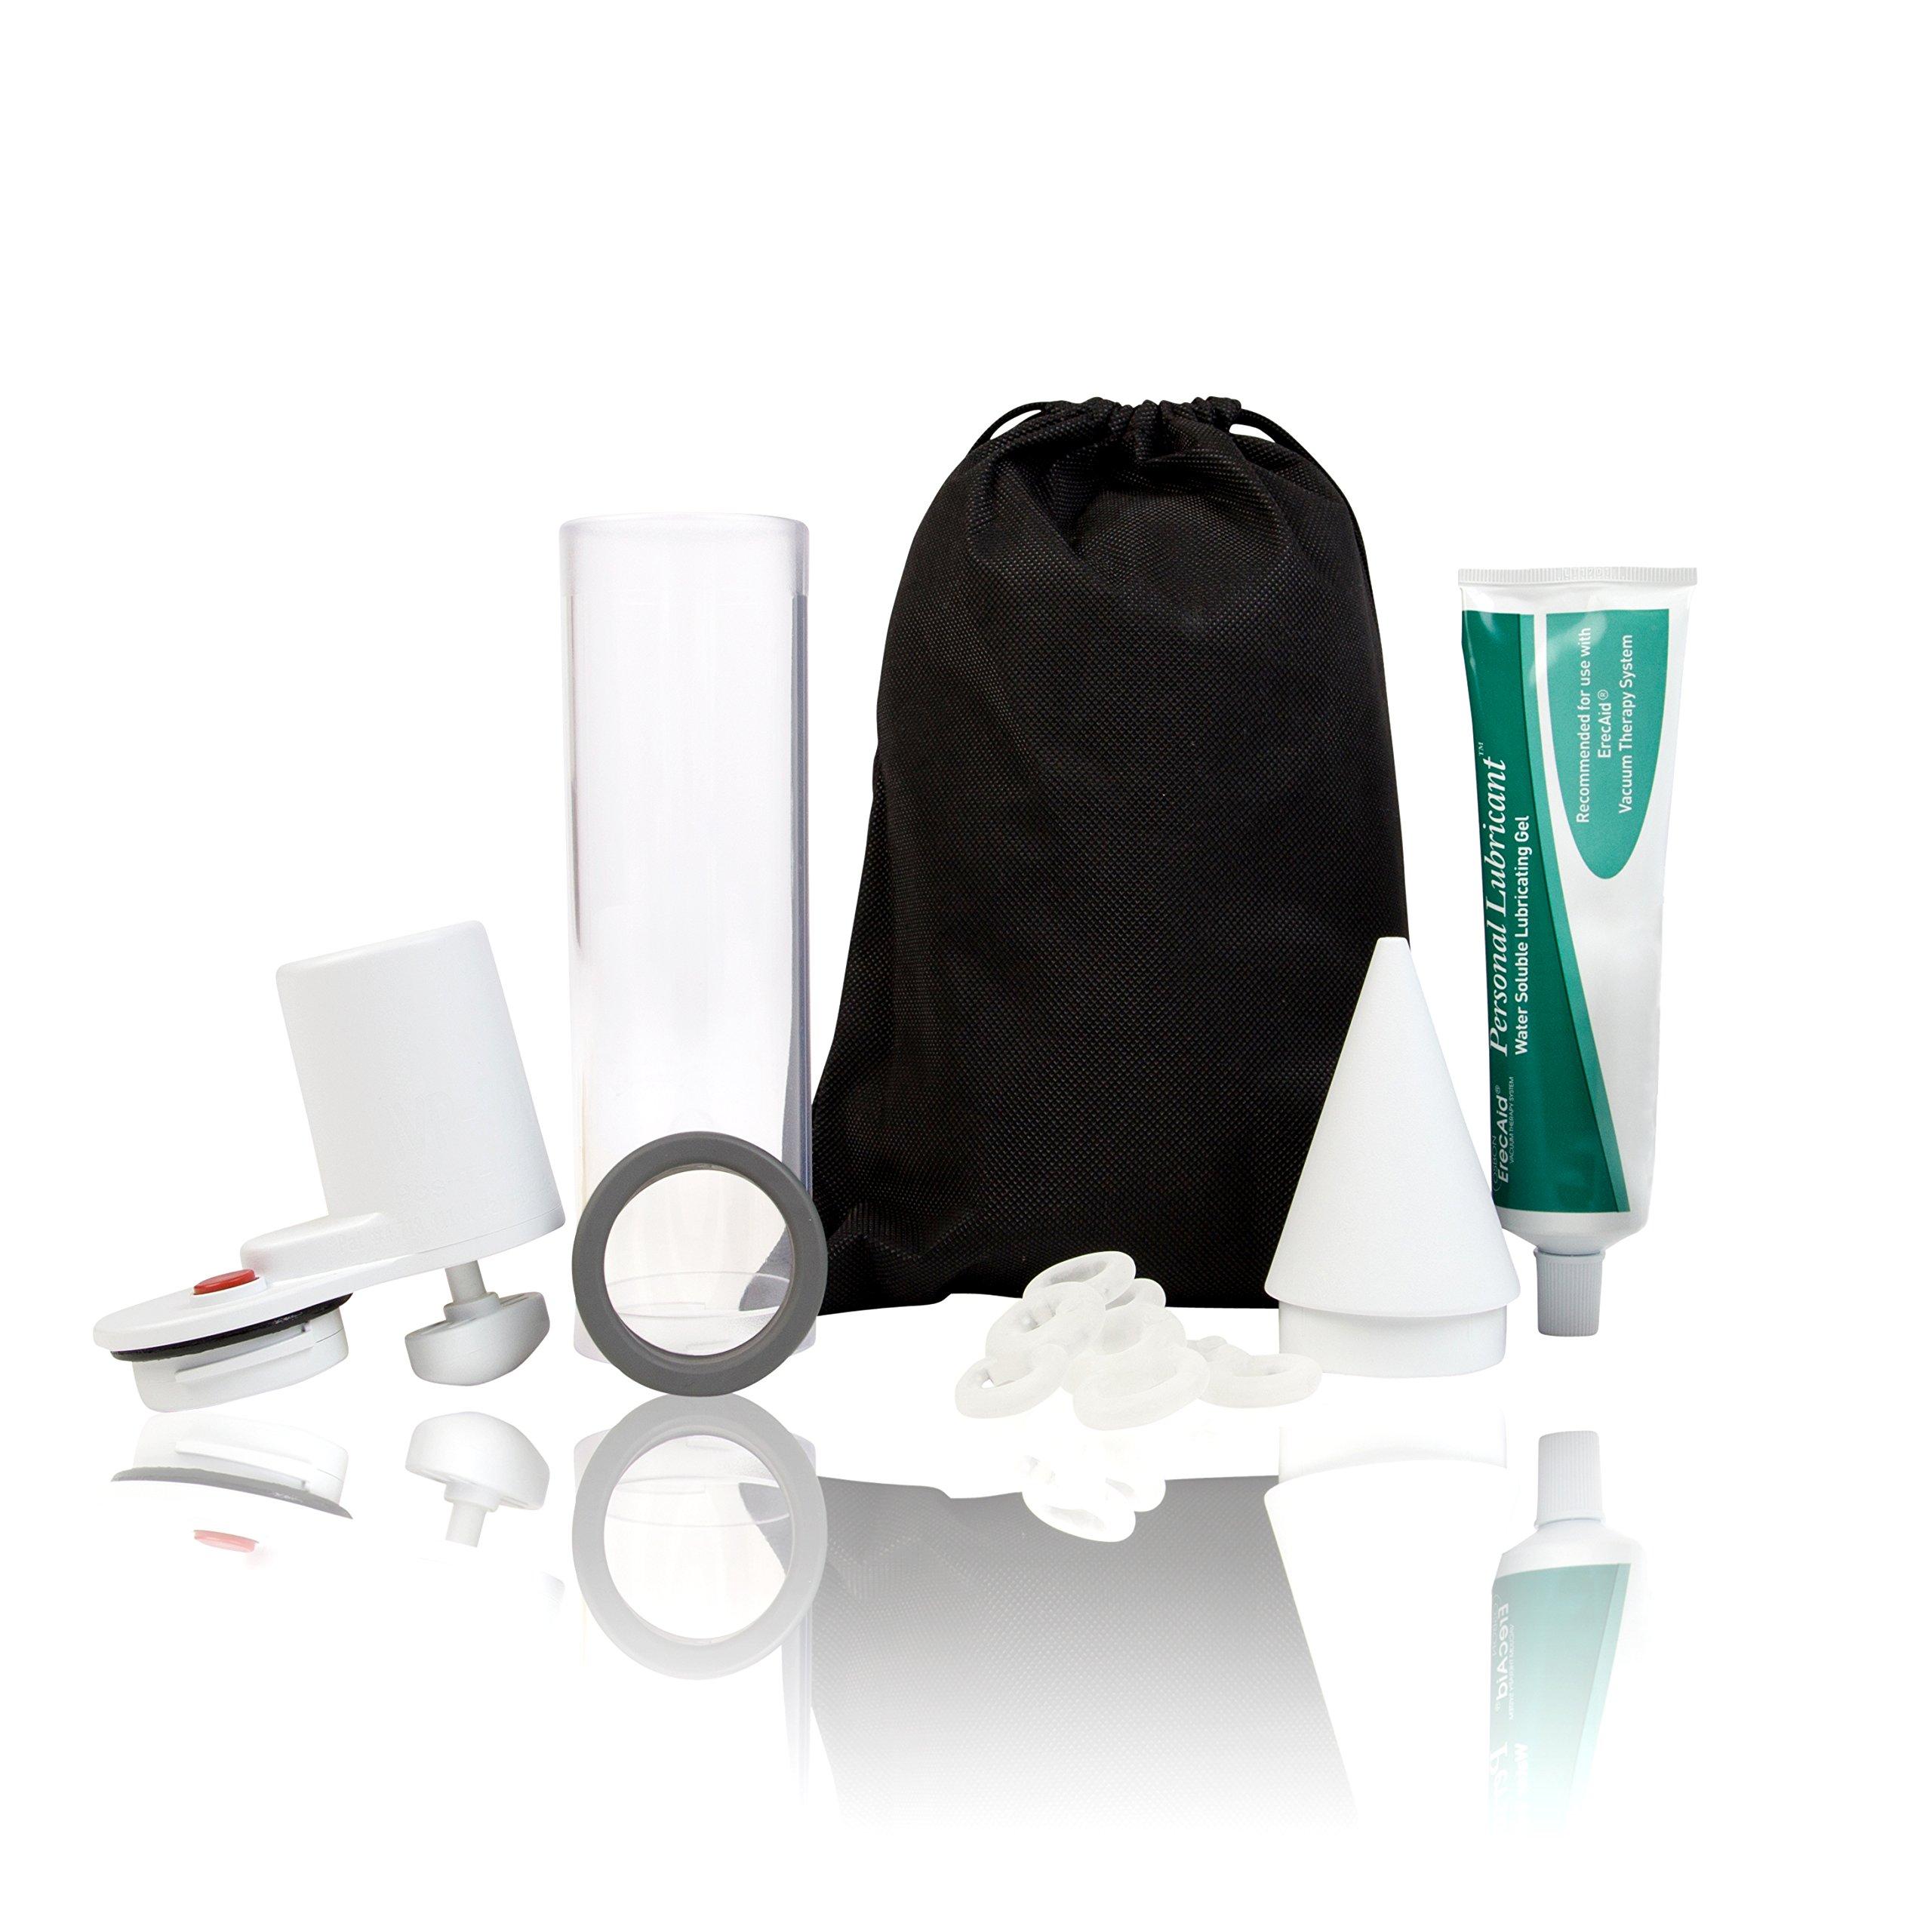 Vacuum Pump for Men, Natural Alternative to Erectile Dysfunction Pills, Manual Penis Pump, Men's Pump Kit for Erectile Dysfunction - Pos-T-Vac, Ultra Max Erectile Dysfunction Pump by POS-T-VAC